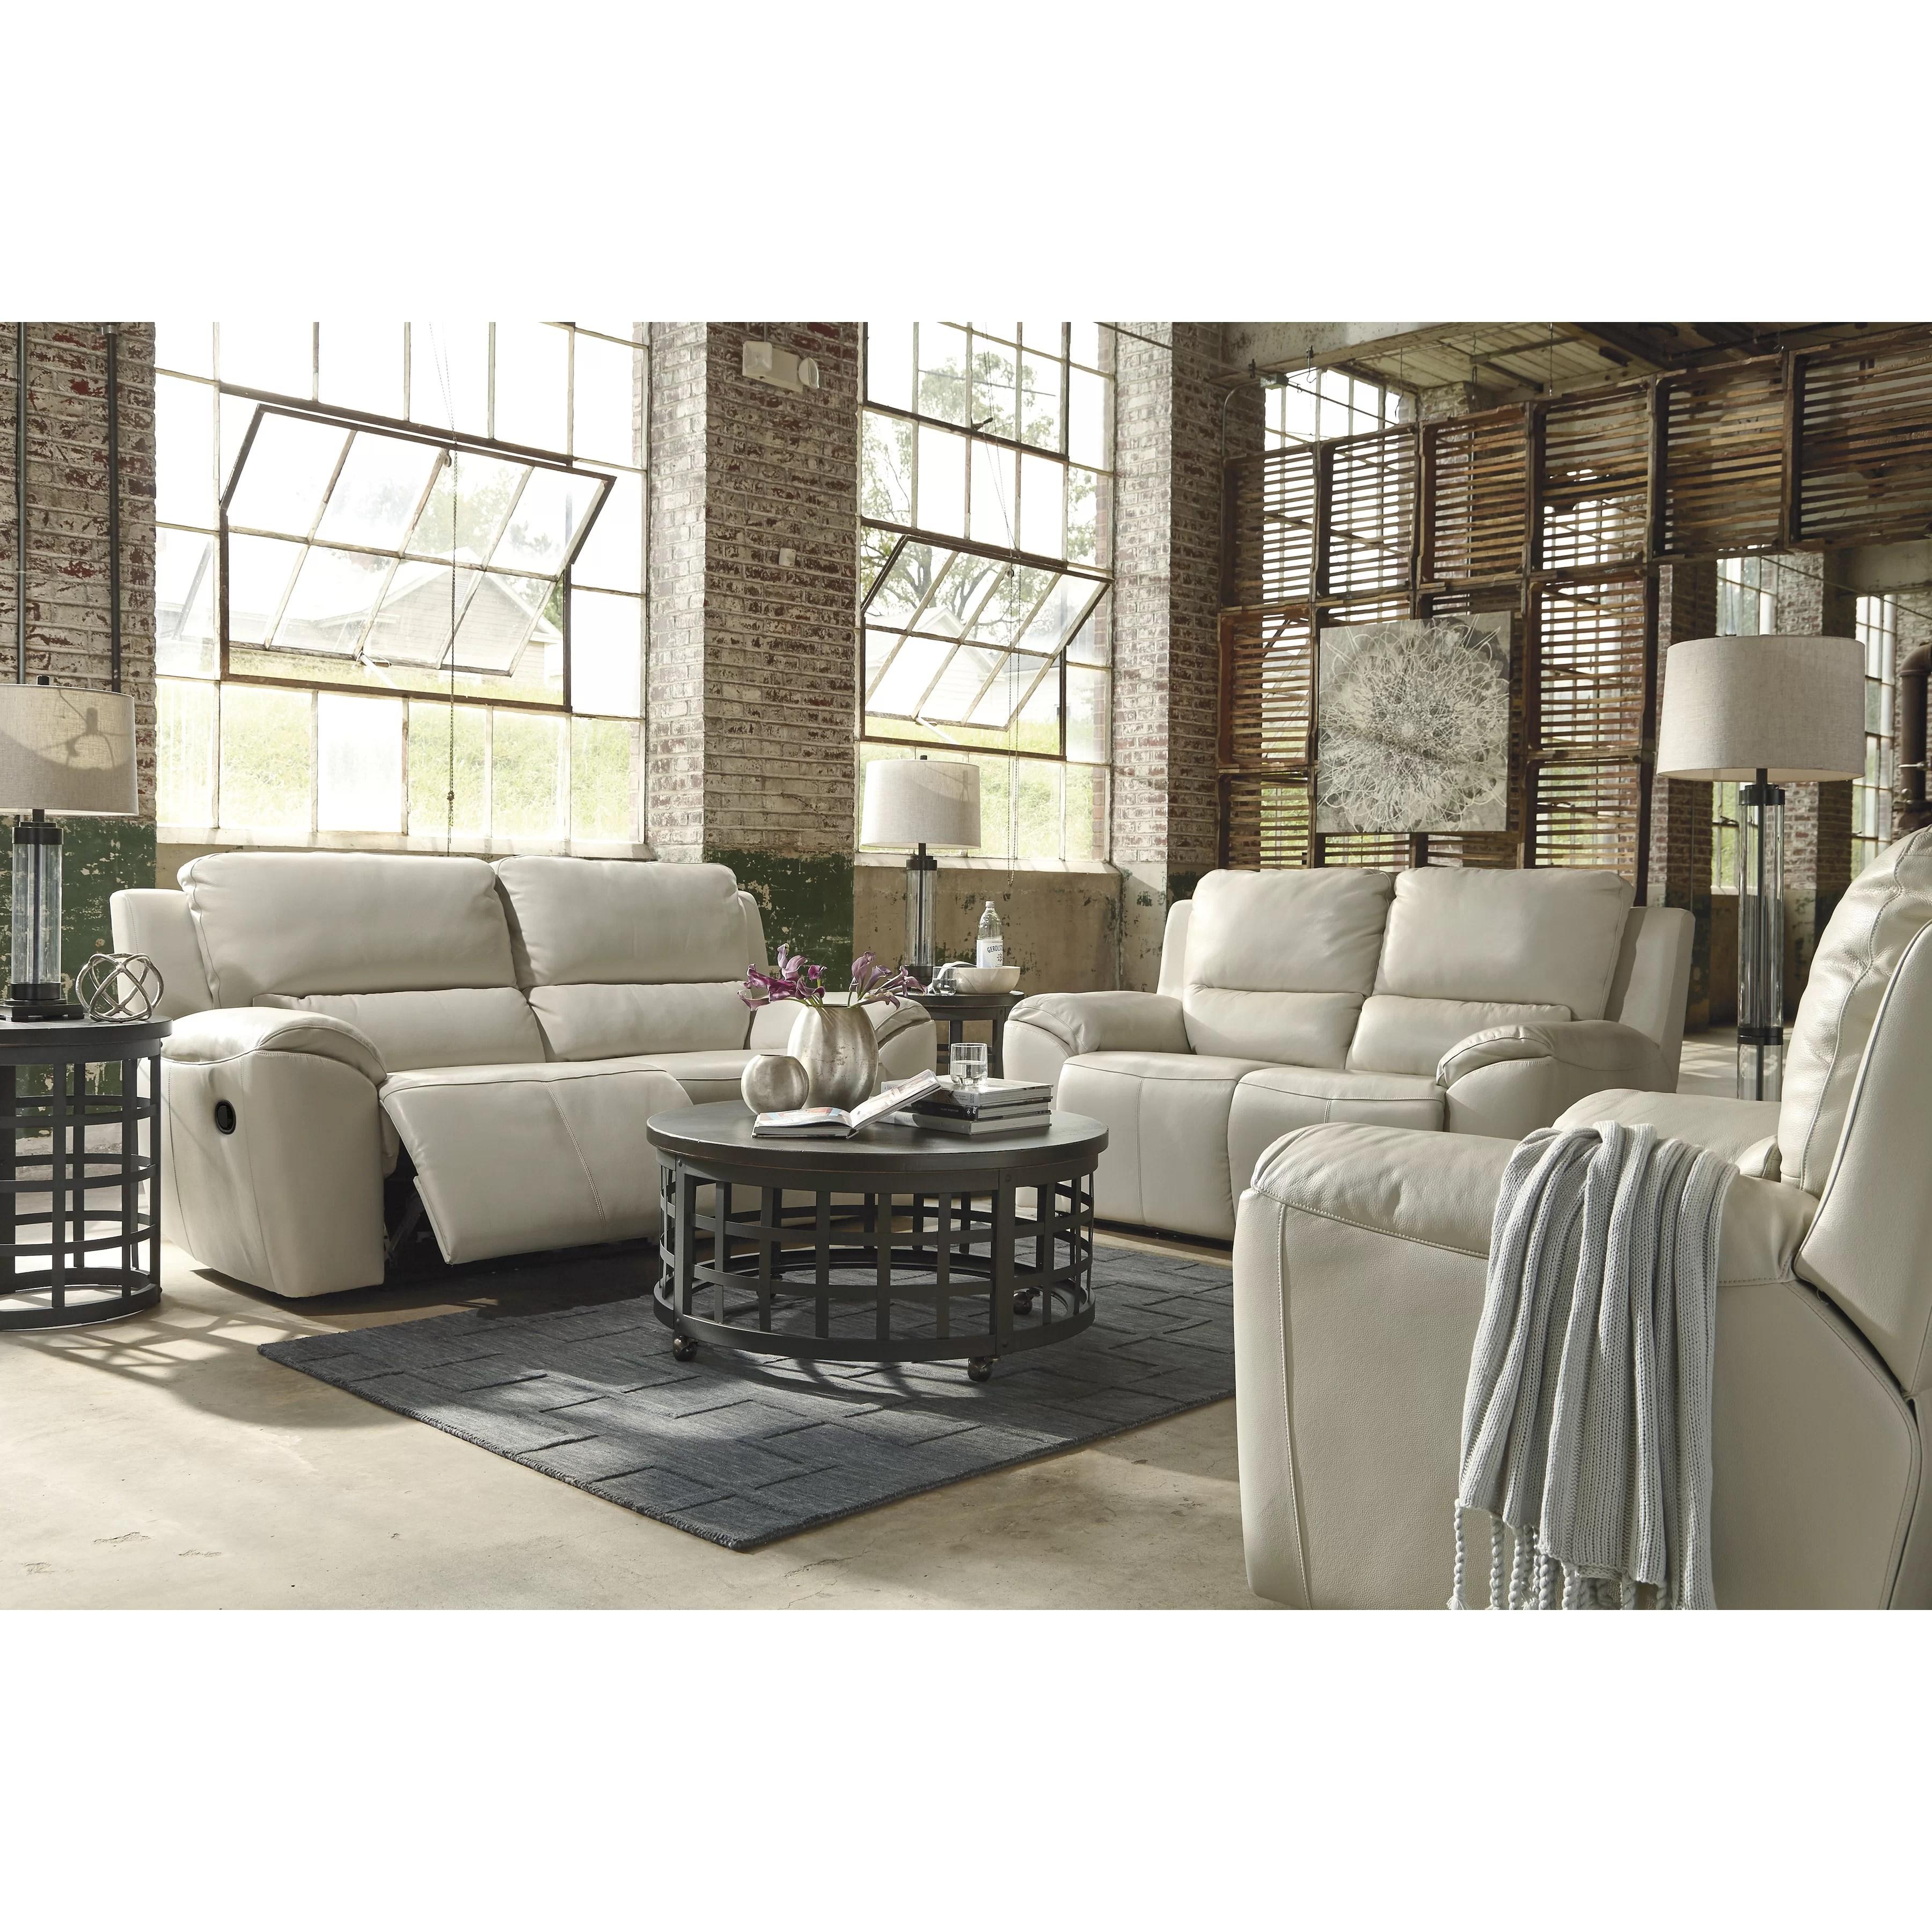 signature design by ashley harvest sleeper sofa grand tour leather 2 seat reclining wayfair